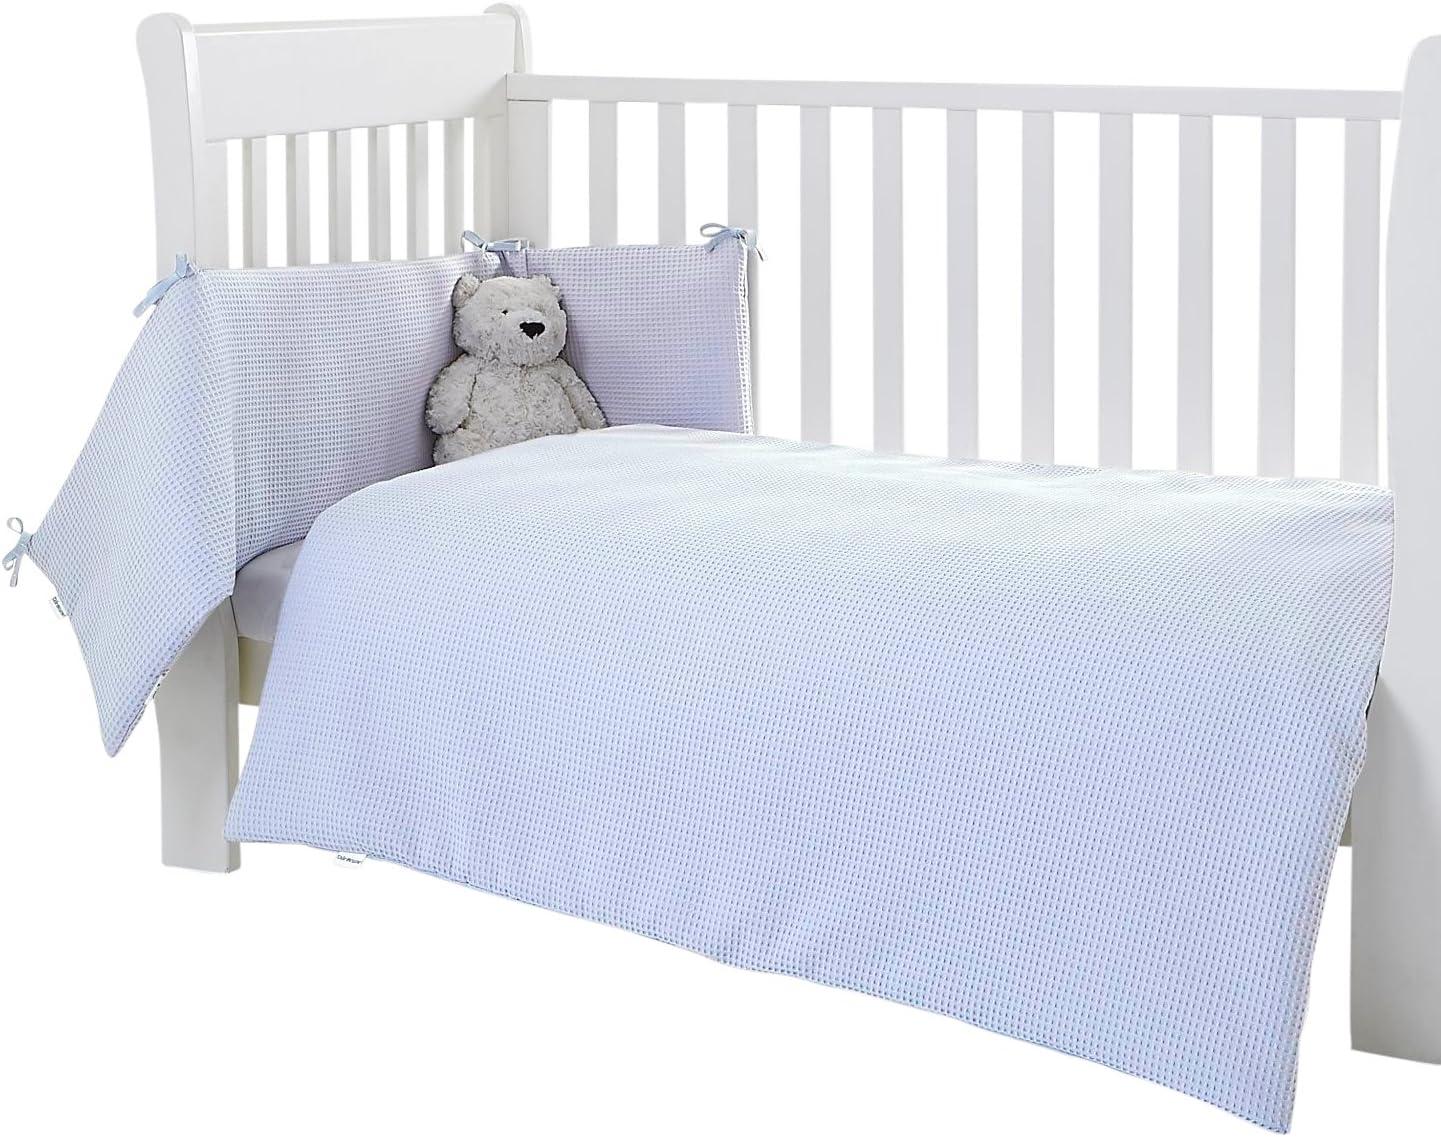 Clair de Lune Waffle Cot//Cot Bed Quilt and Bumper Set